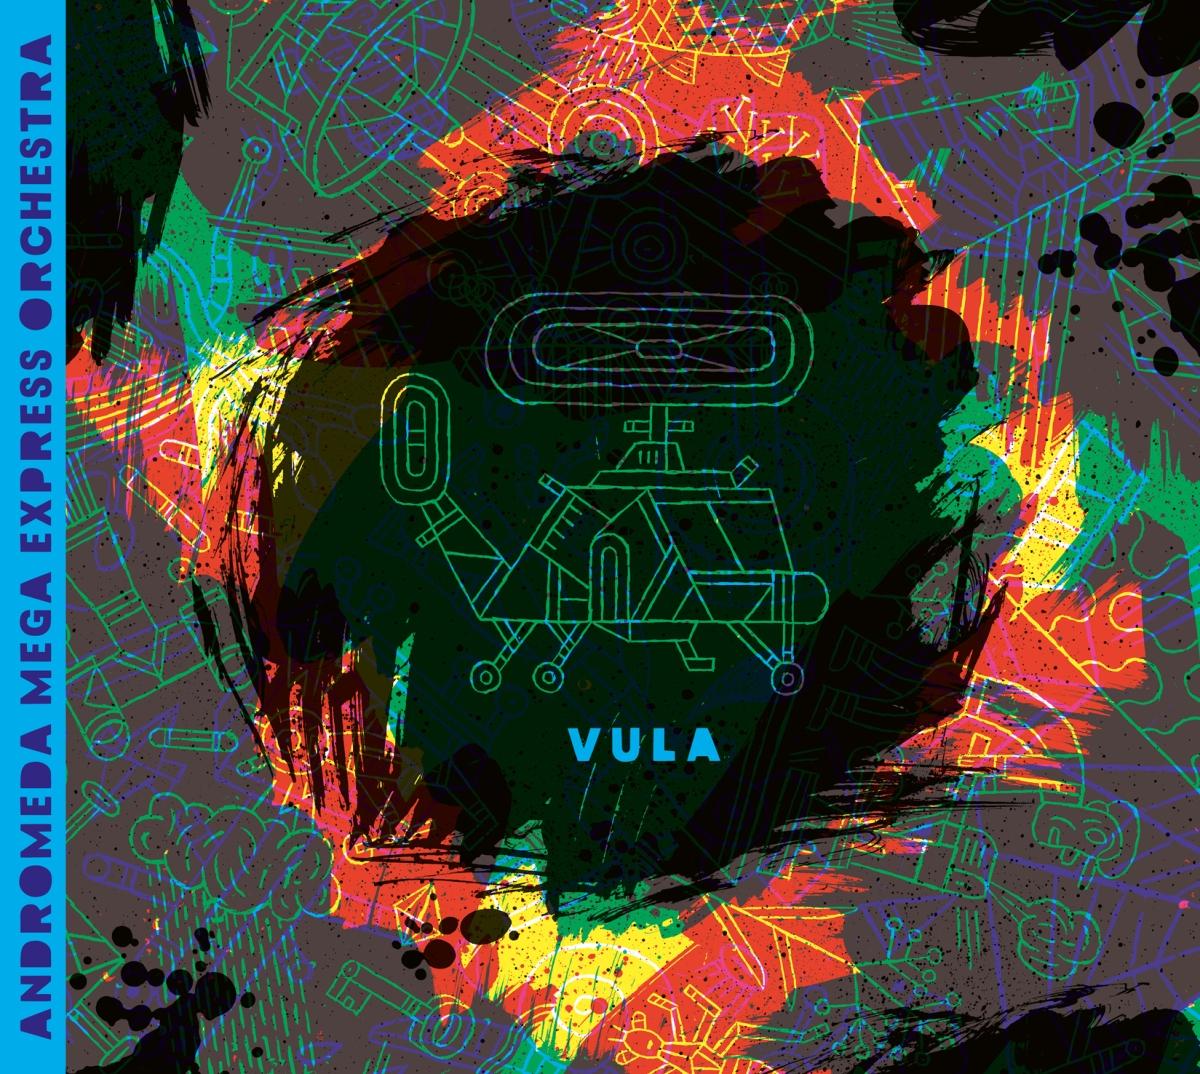 Andromeda Mega Express Orchestra – Vula [Alien Transistor2017]